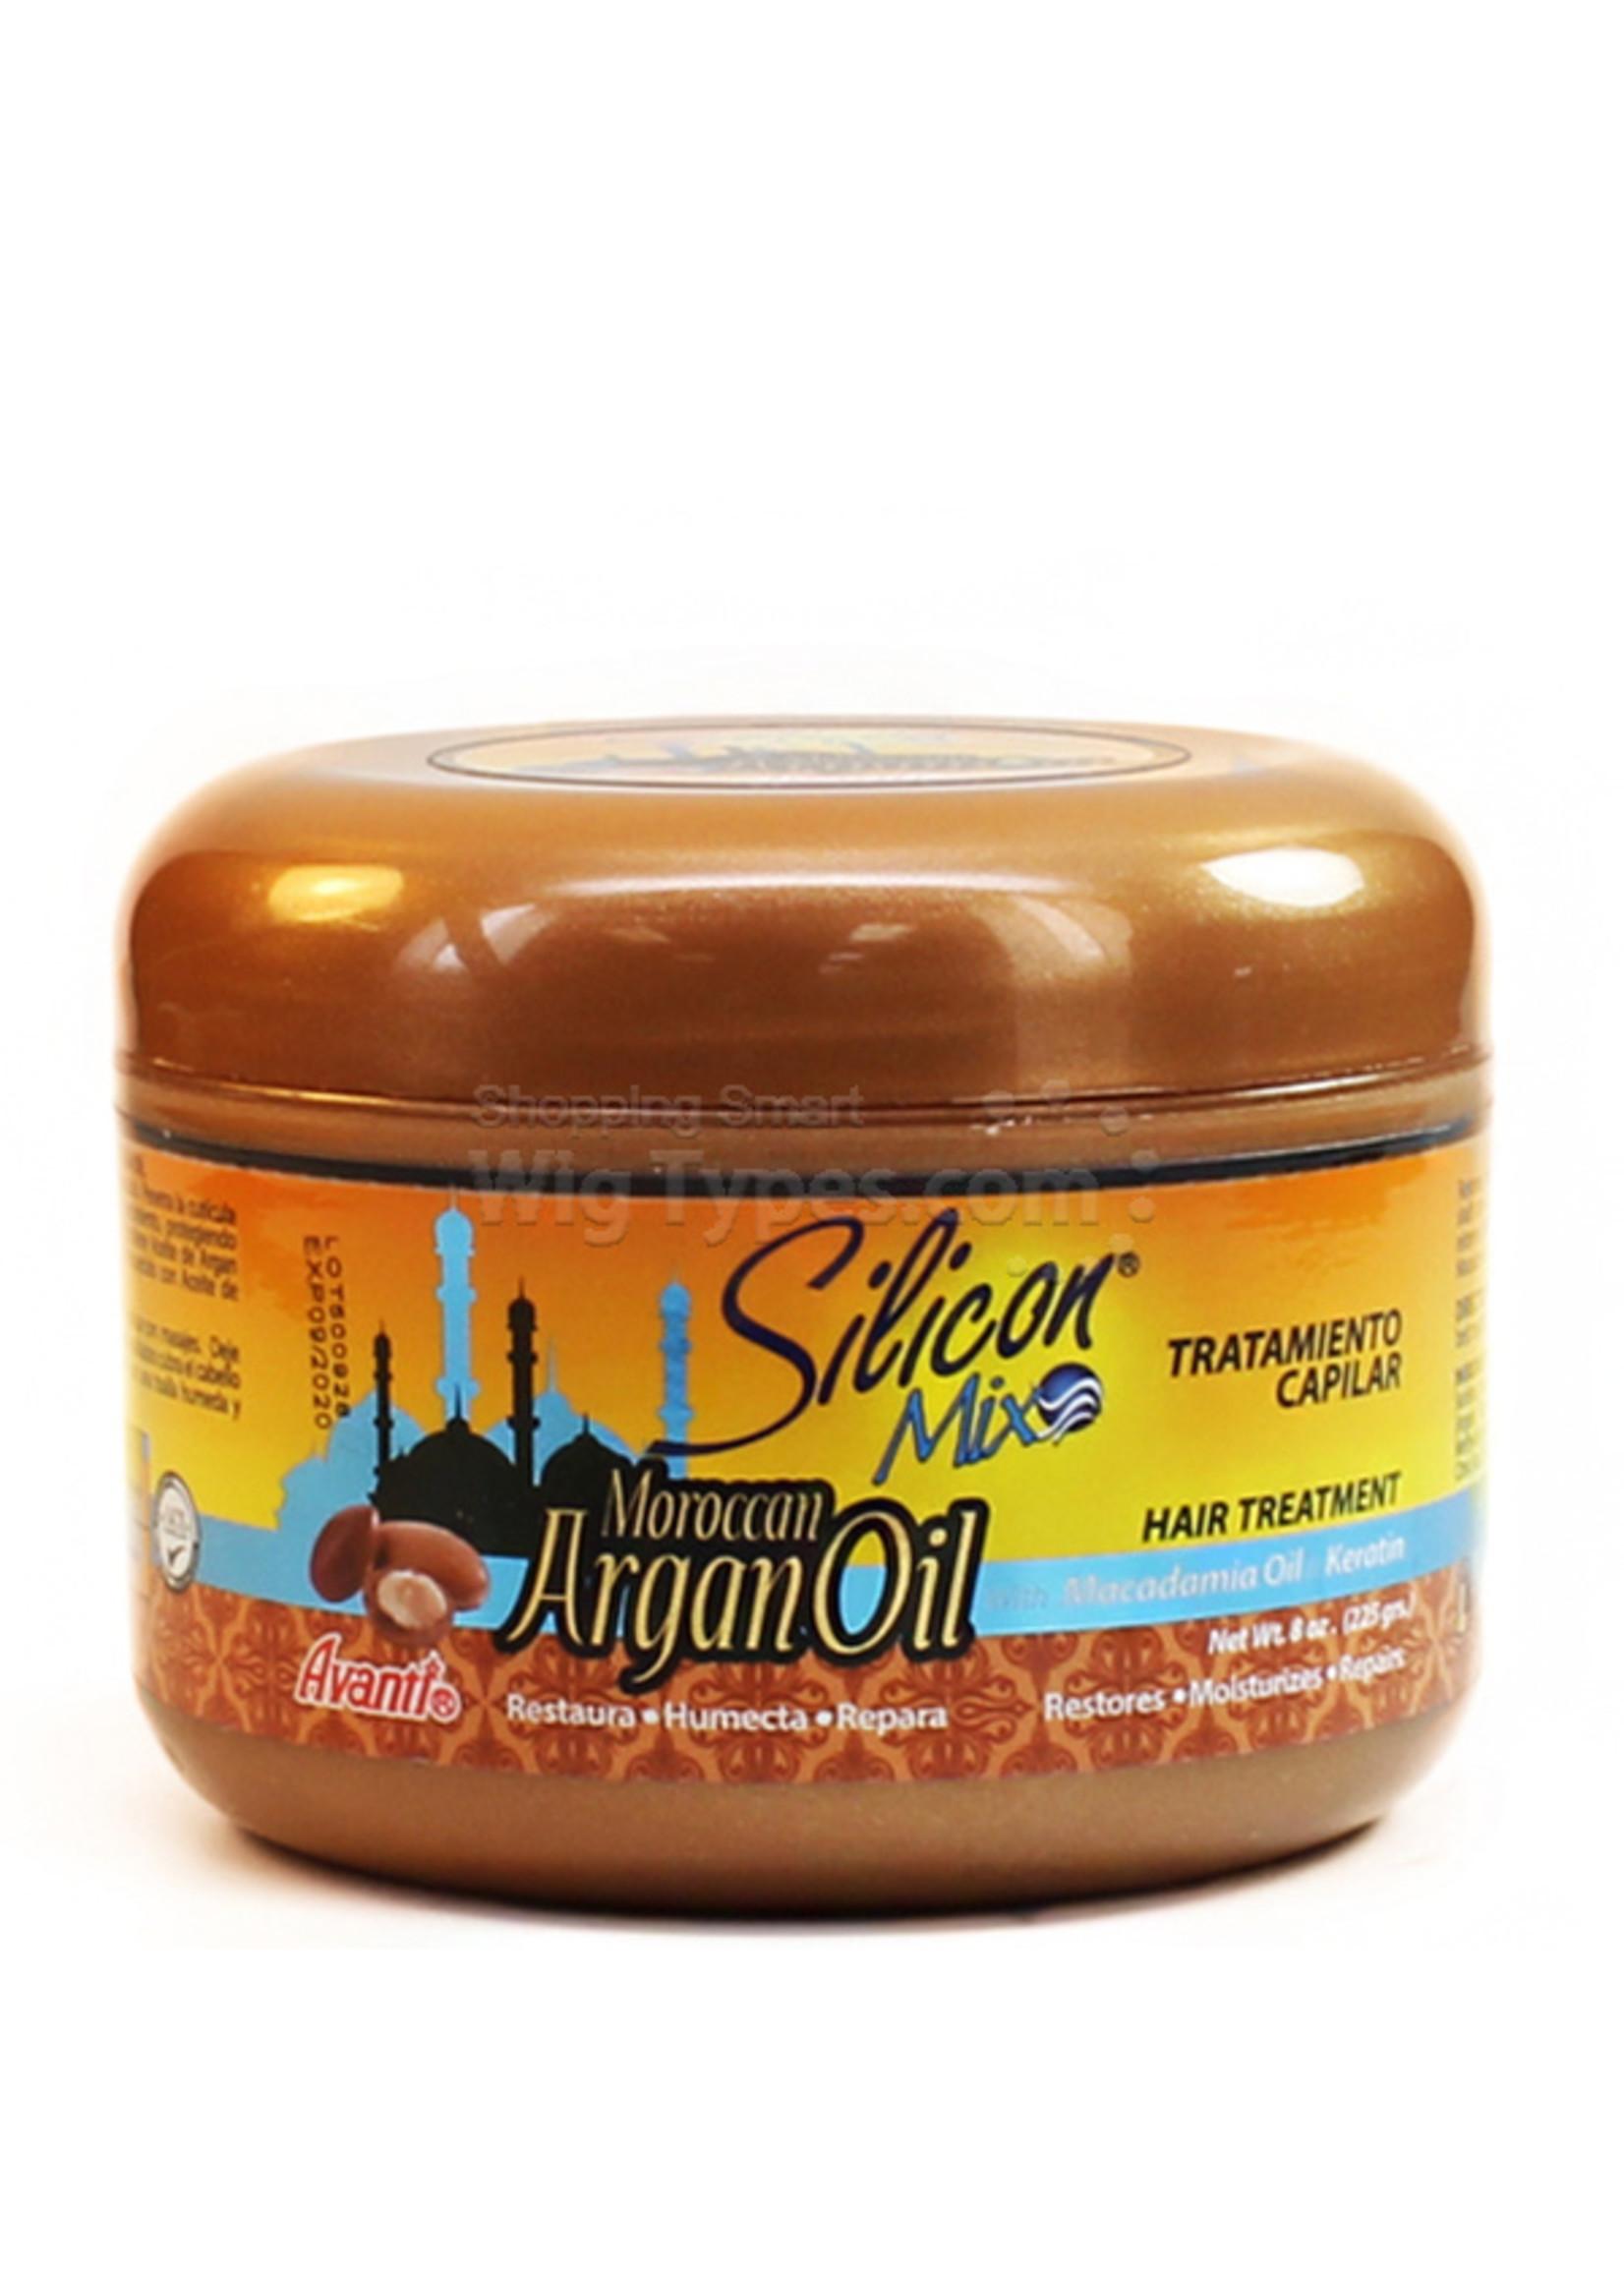 Silicon Mix Moroccan Argan Oil Silicon Mix Hair Treatment